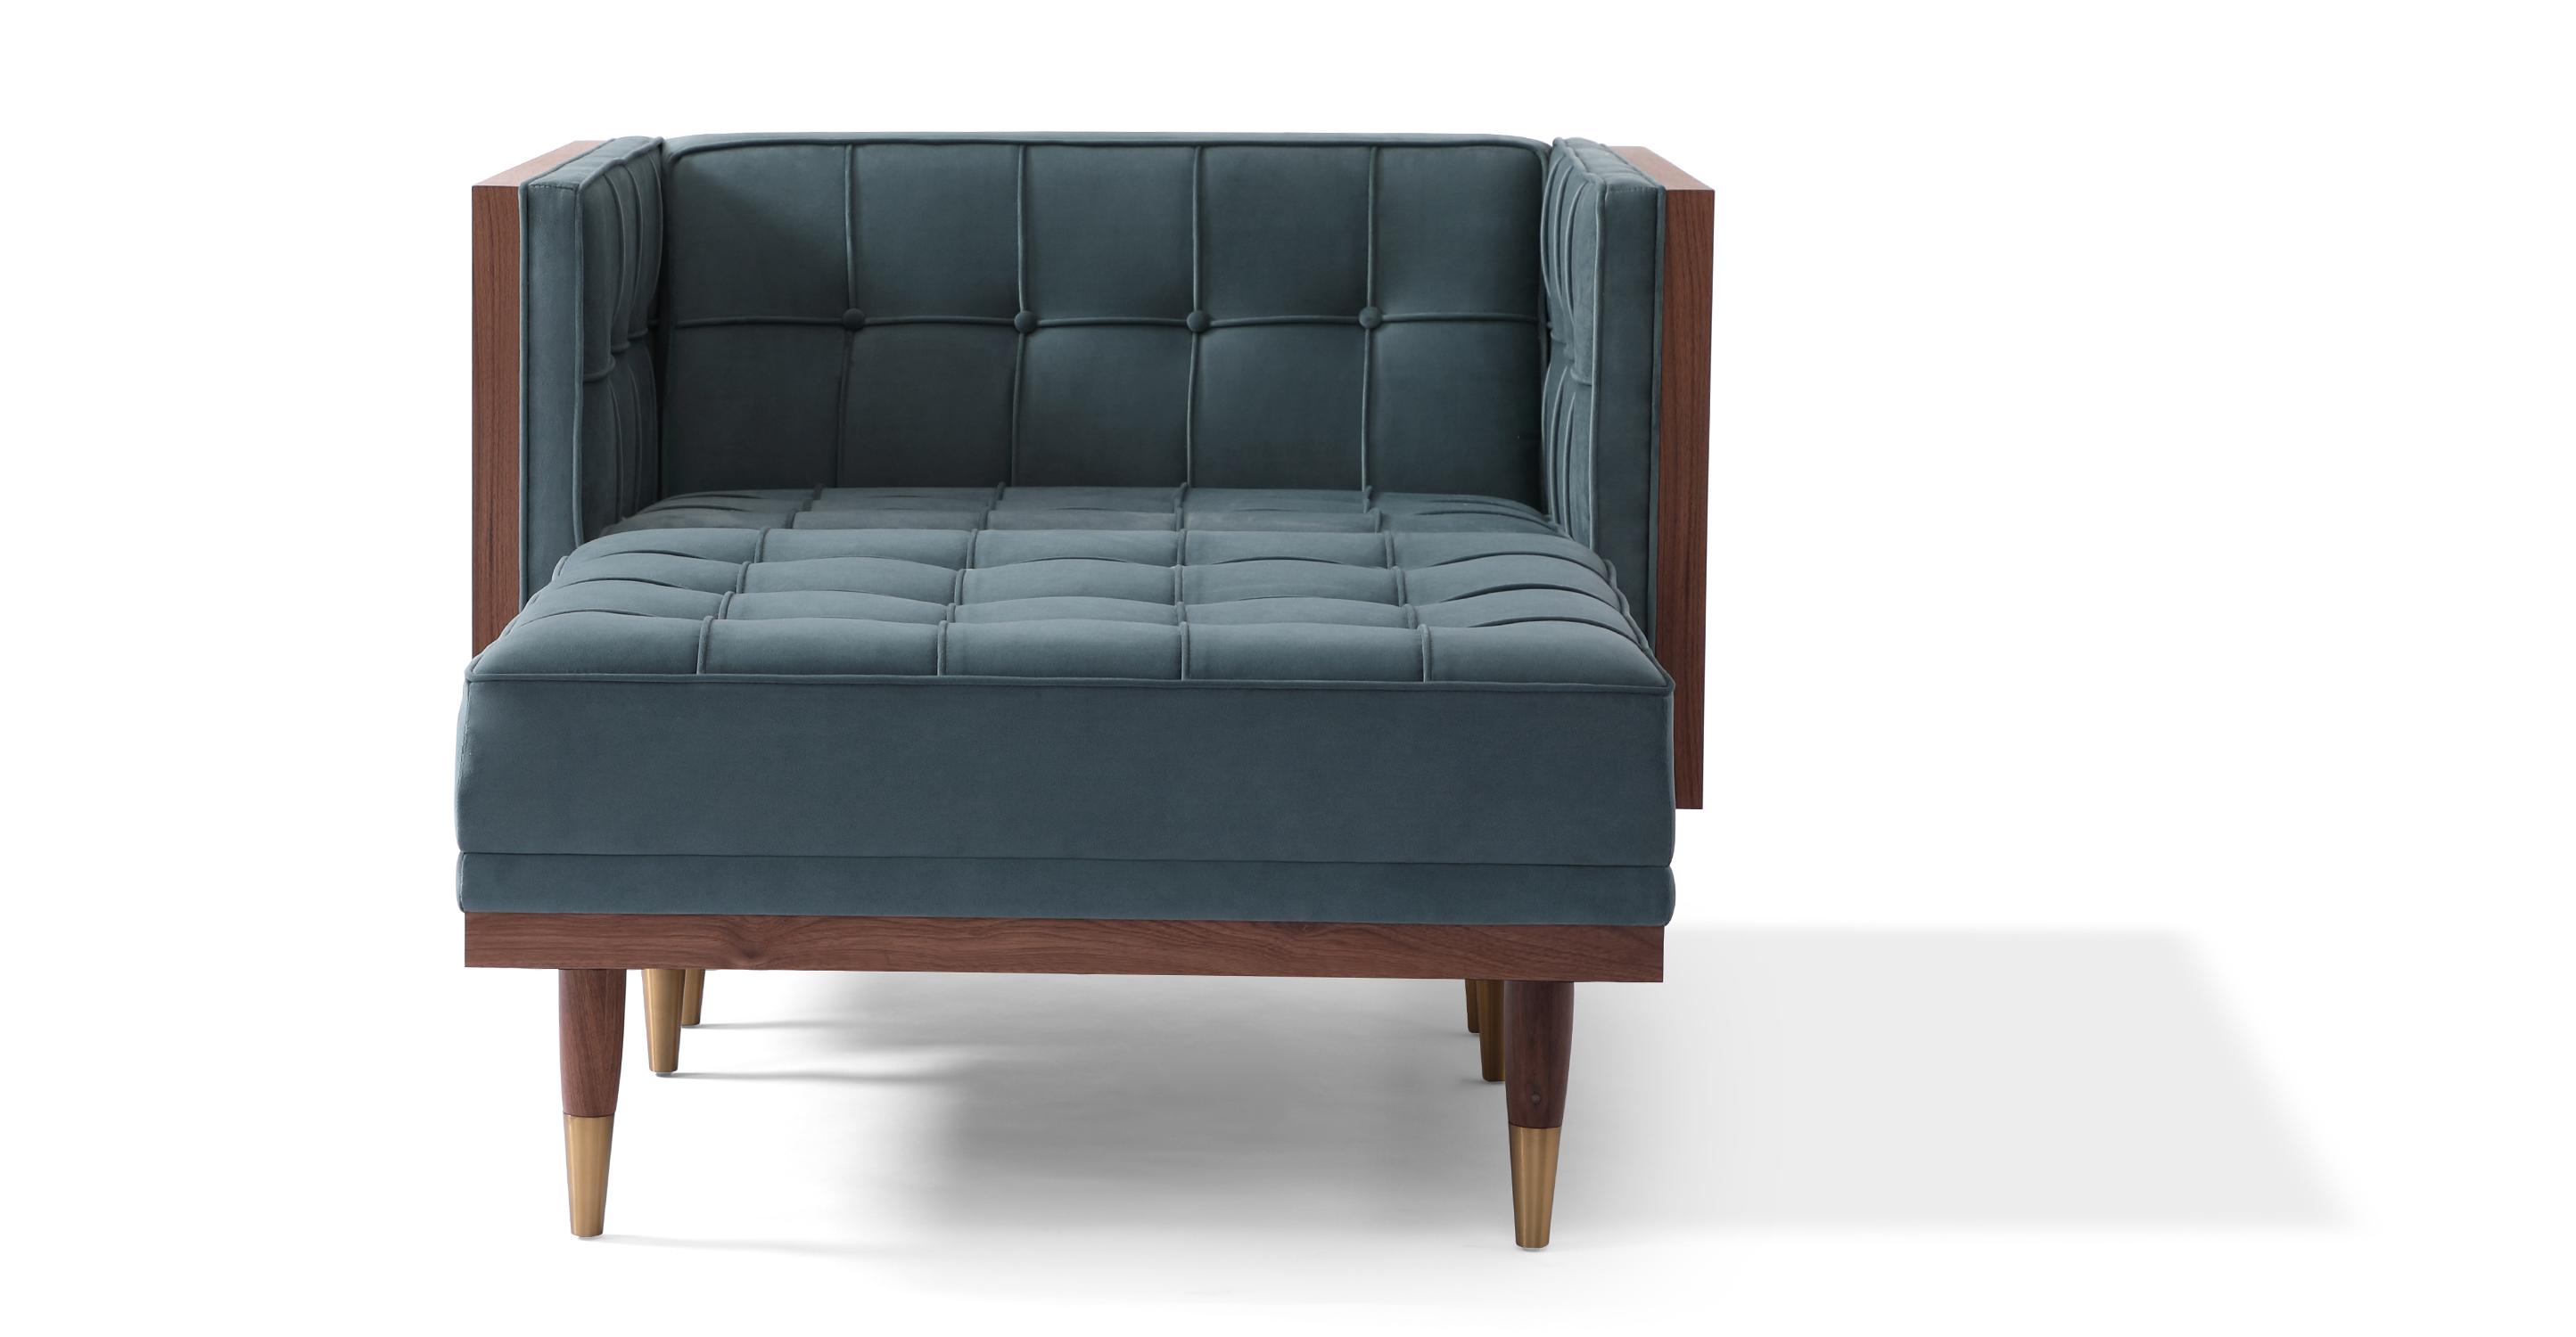 Woodrow Box Fabric Chair & Ottoman, Walnut/Neptune Velvet